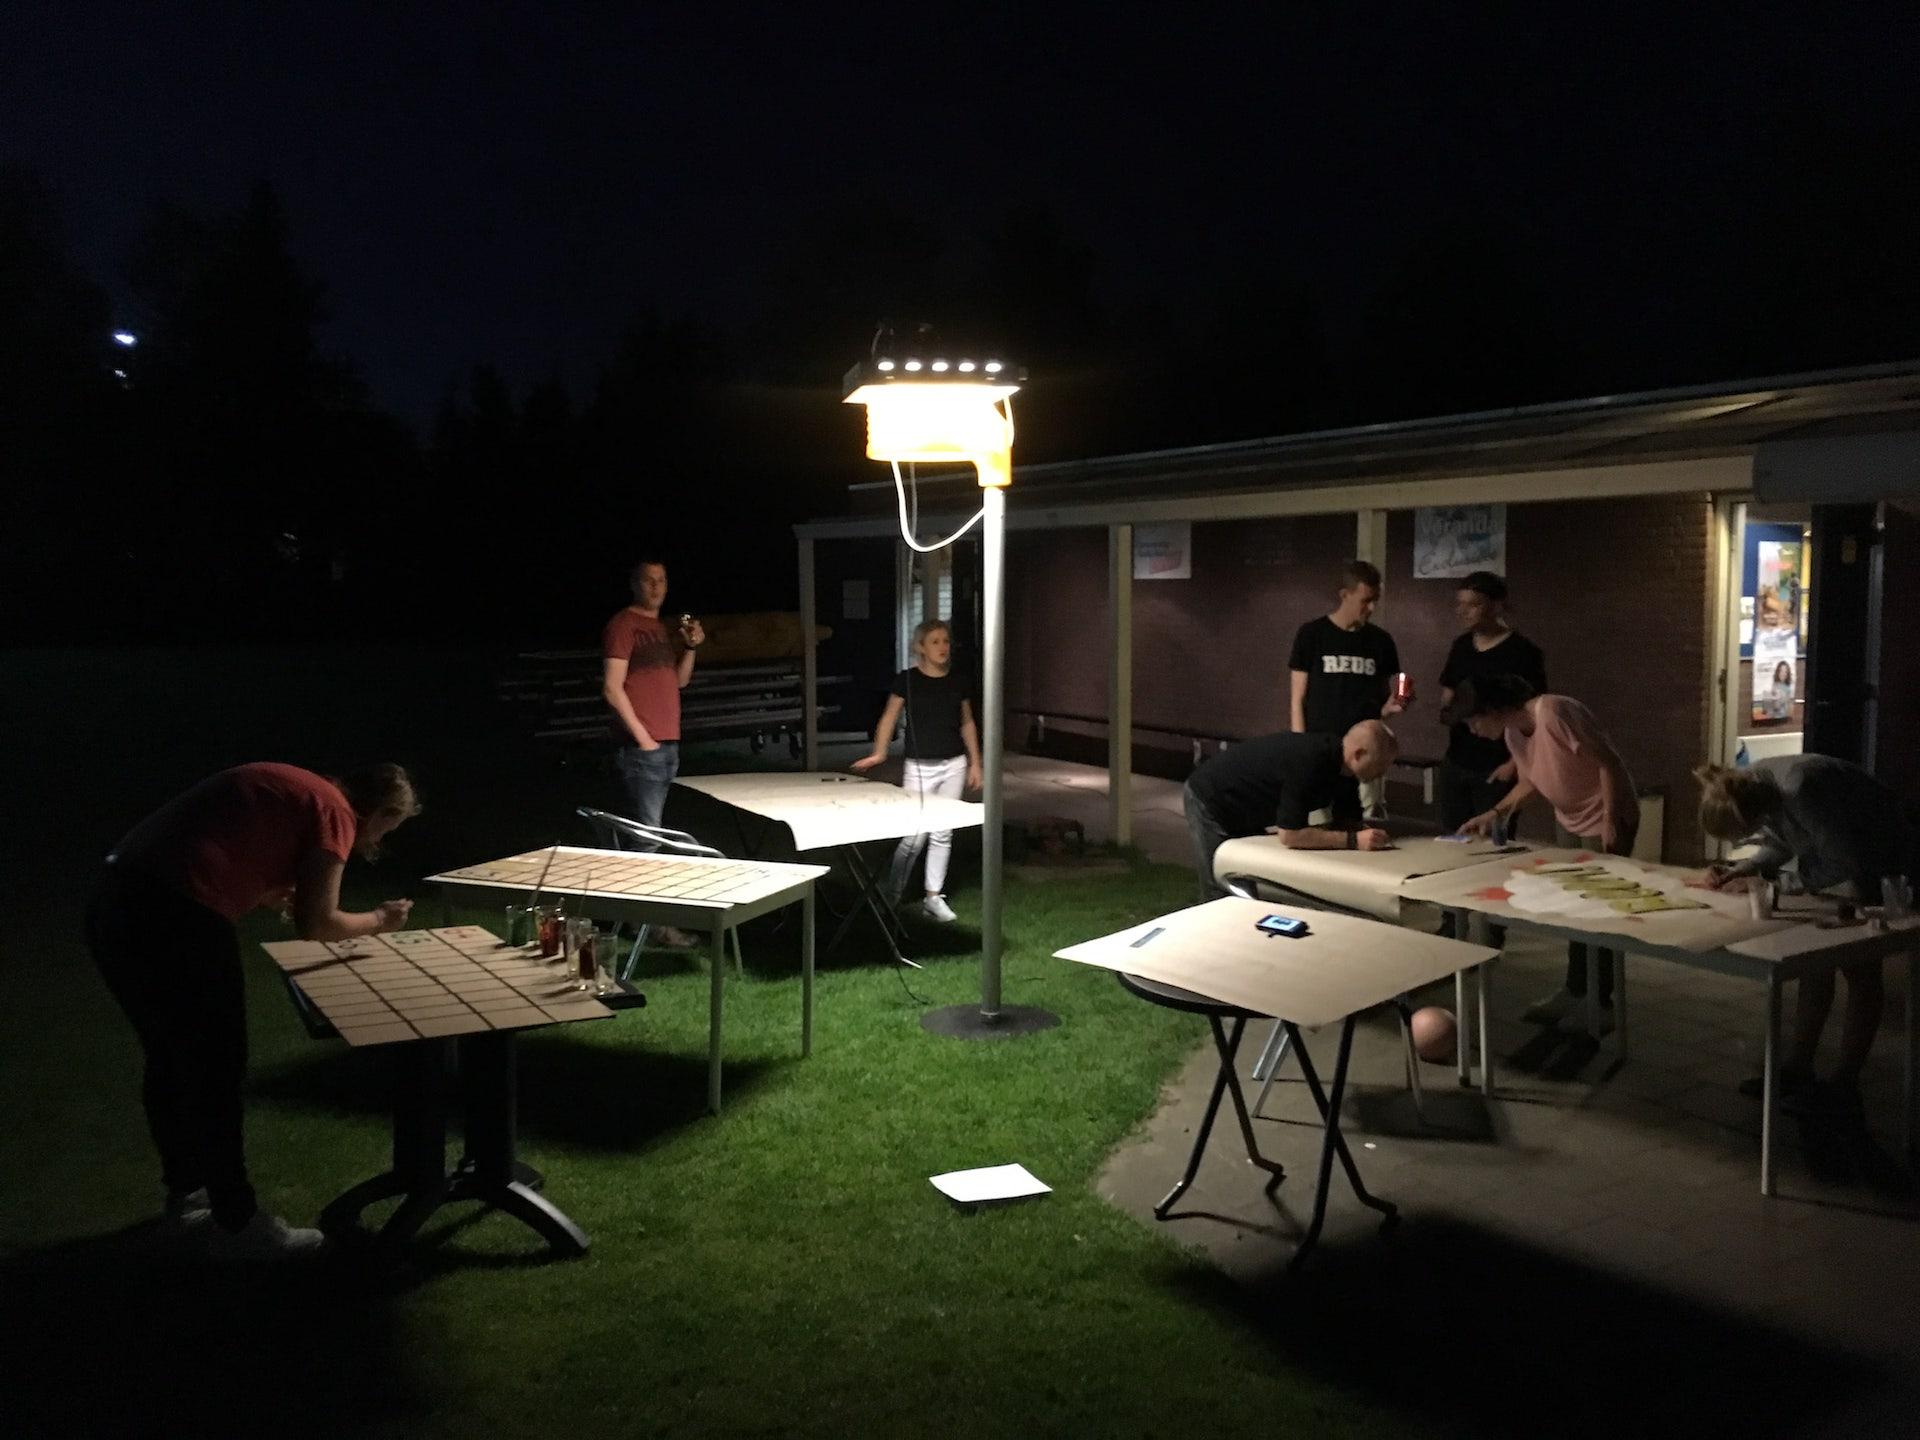 oeckorfbal-jeugdkamp-voorbereidingen